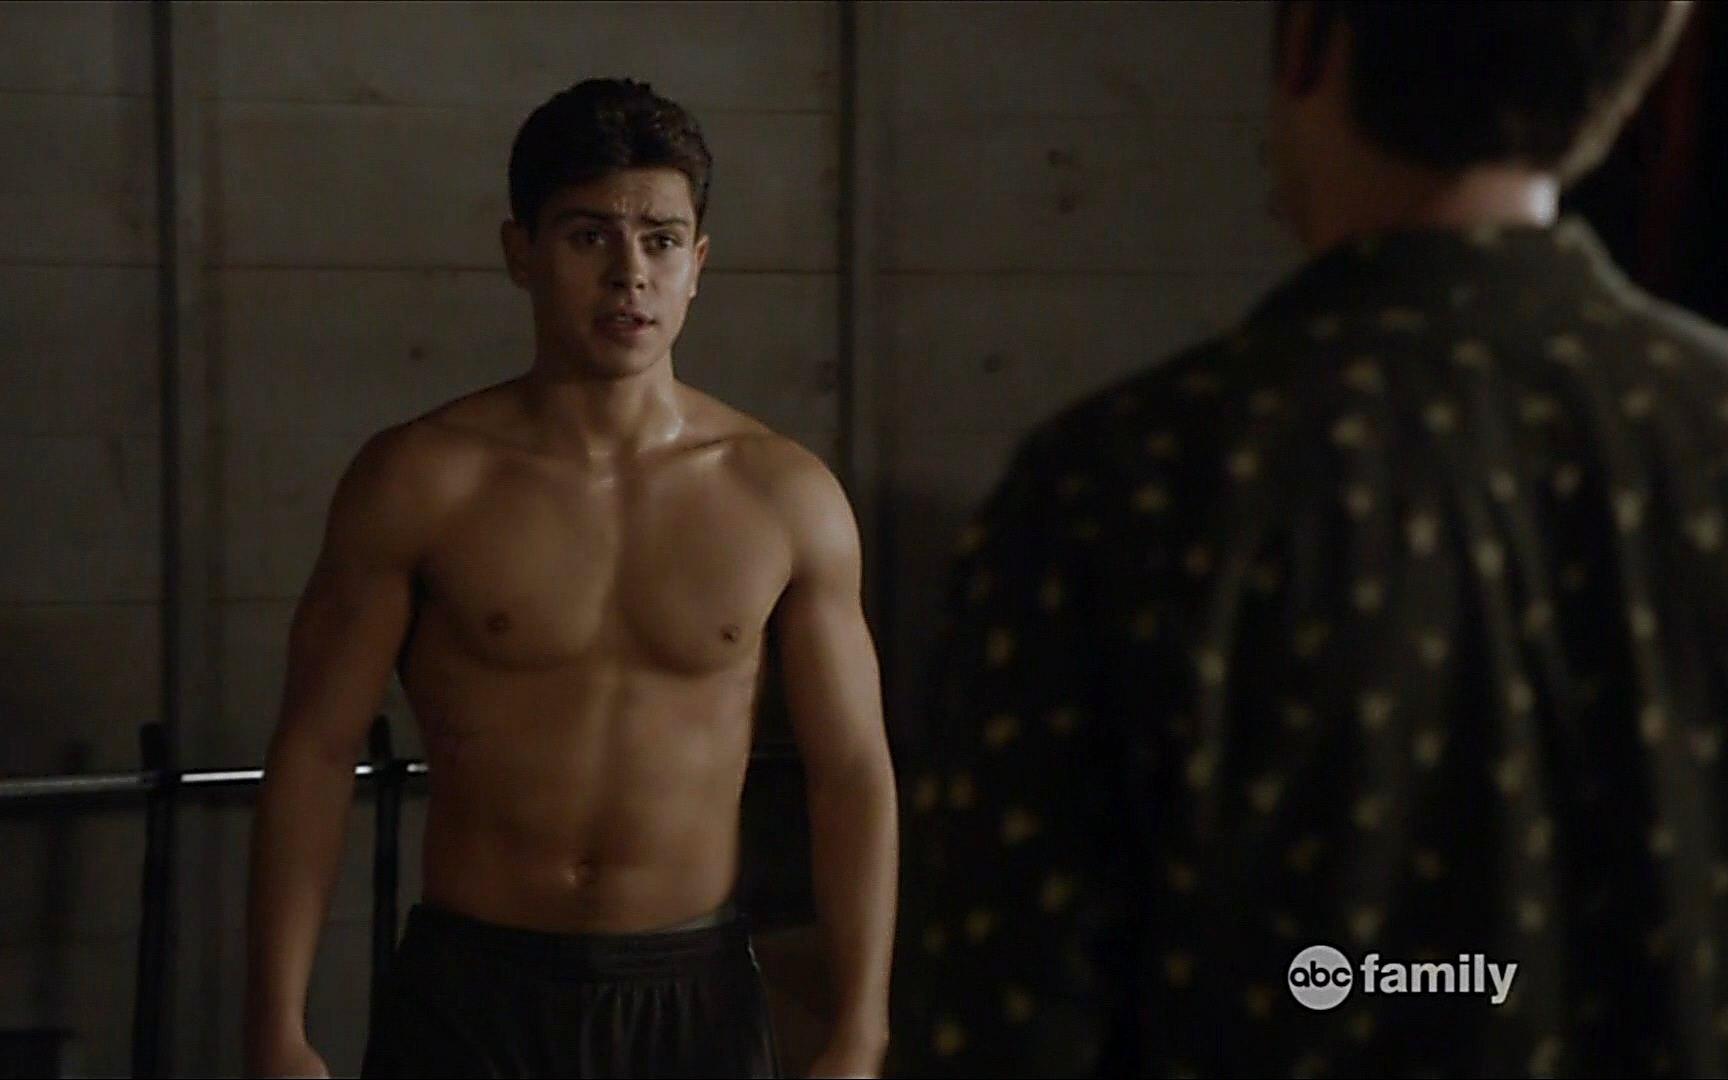 Jake T Austin sexy shirtless scene February 23, 2015, 10pm